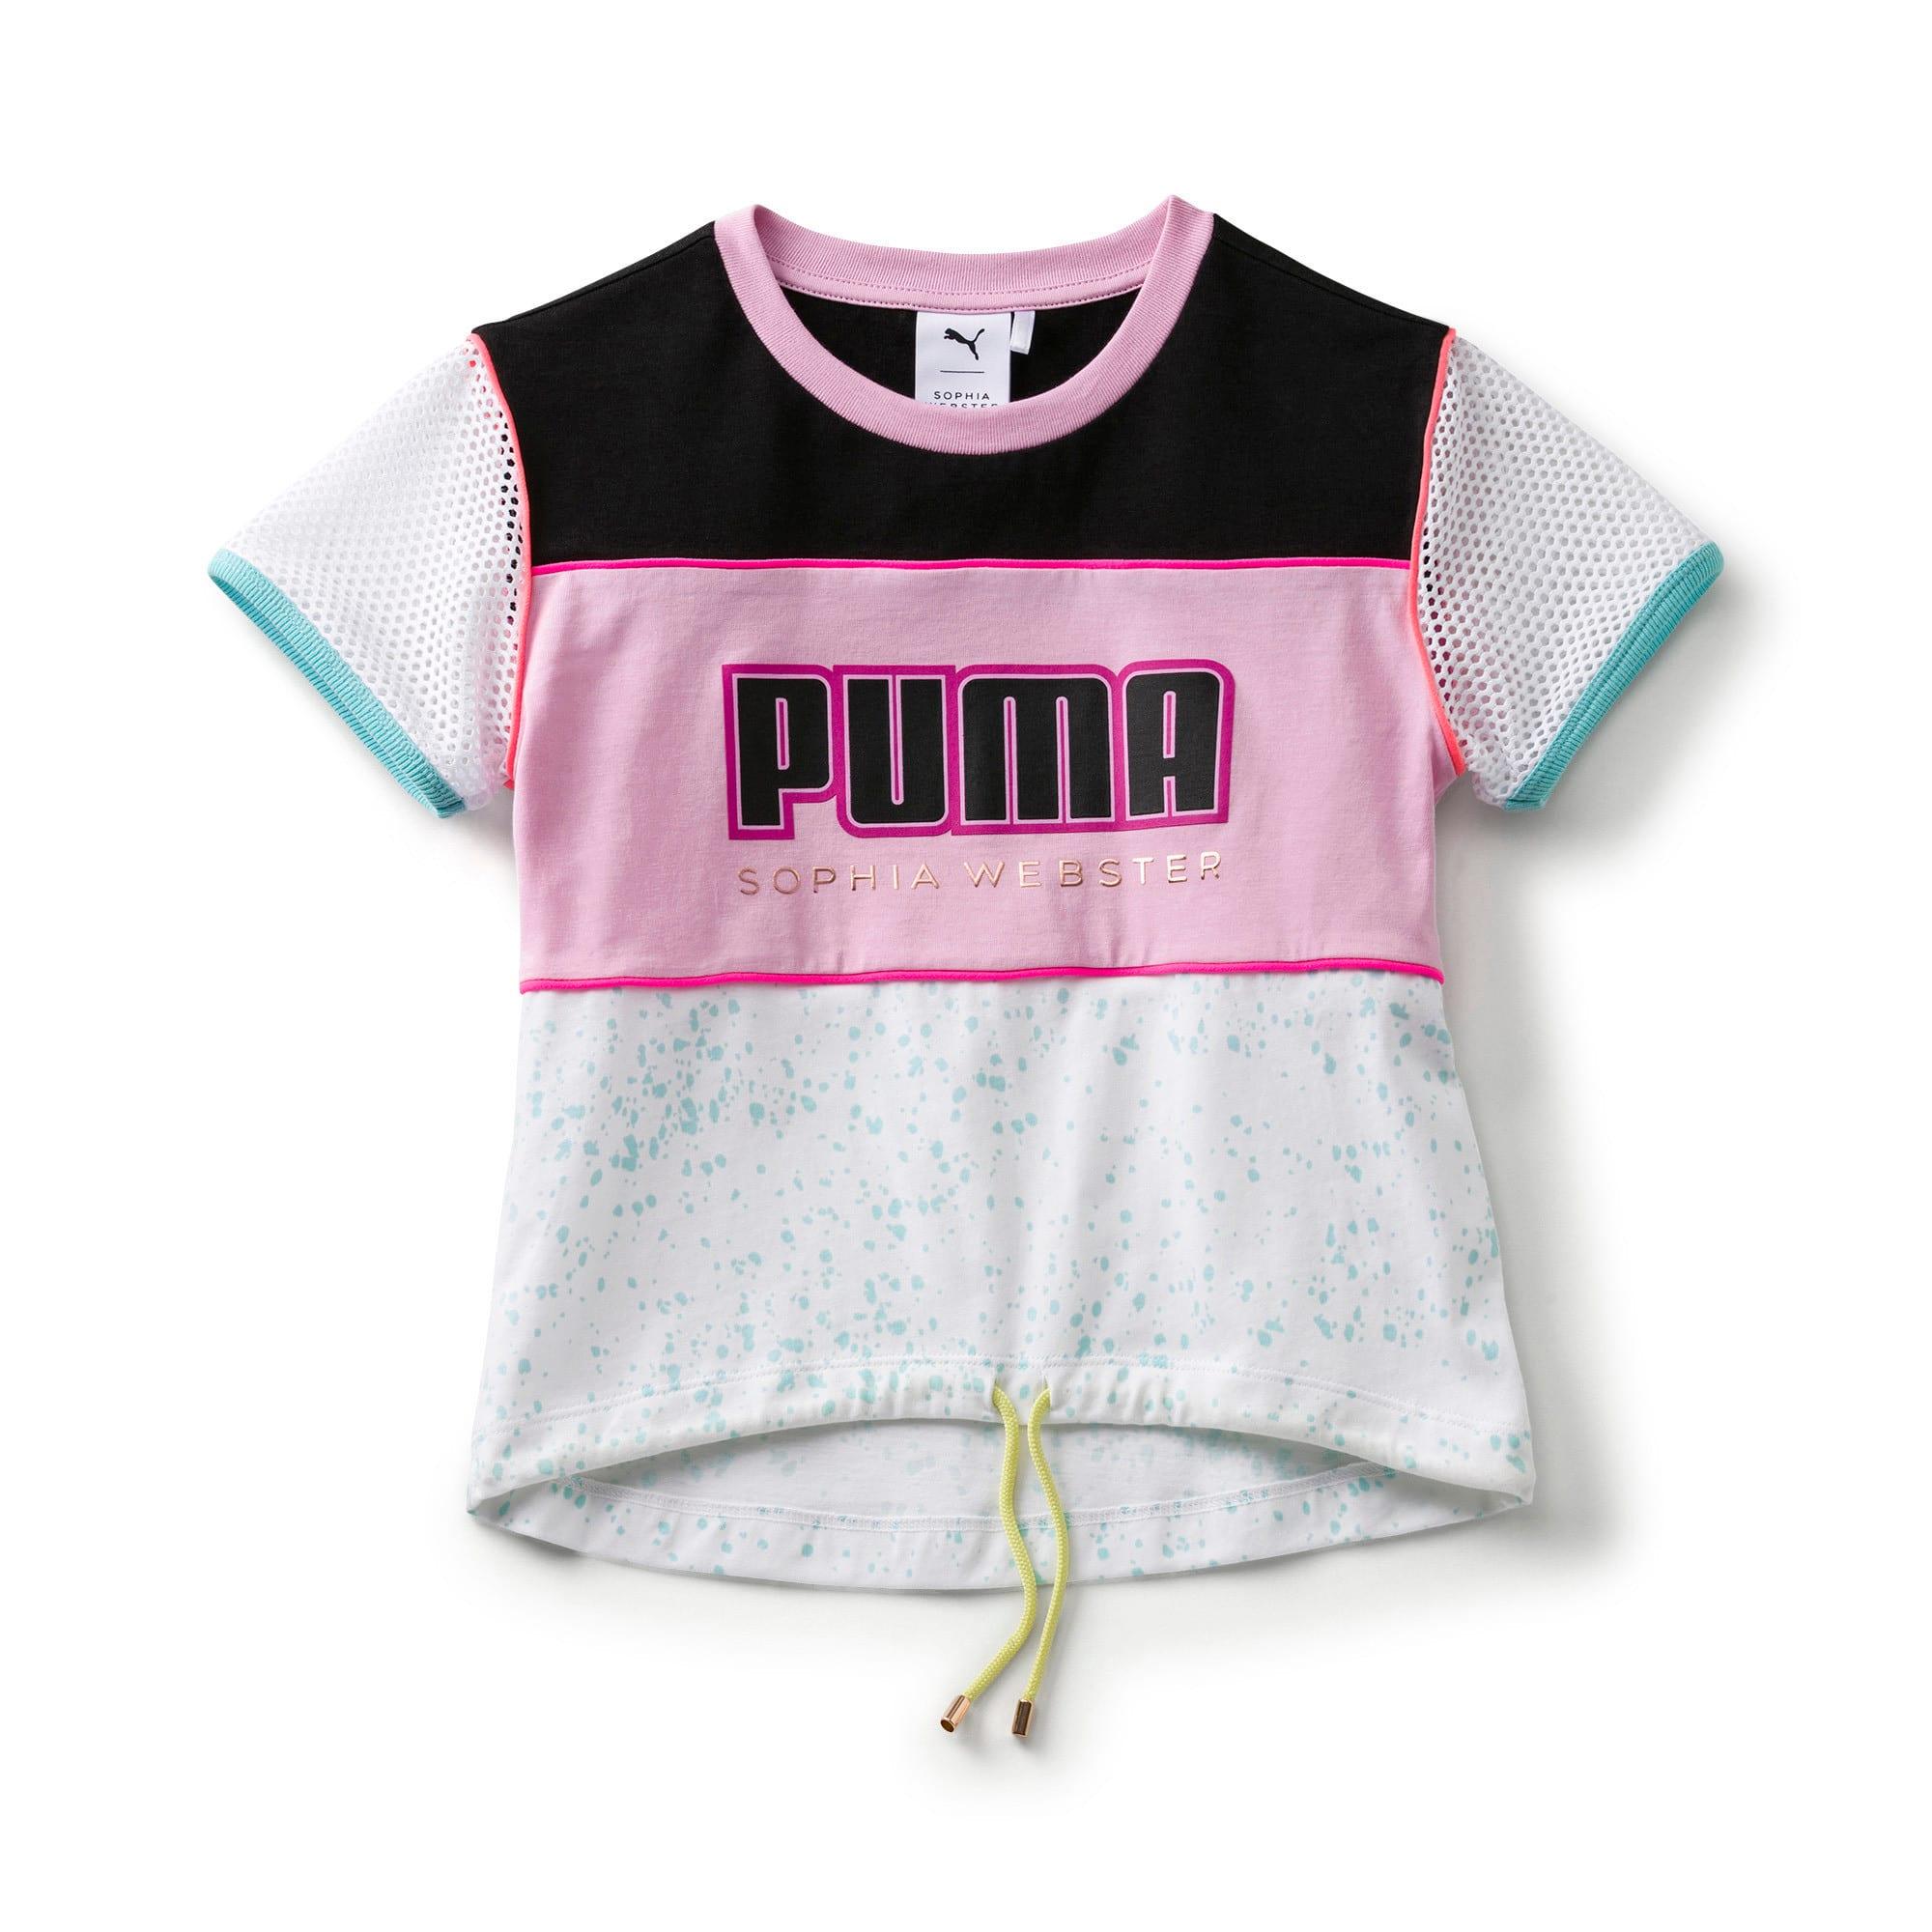 Thumbnail 1 of キッズ ガールズ PUMA x SOPHIA WEBSTER Tシャツ, Puma White, medium-JPN